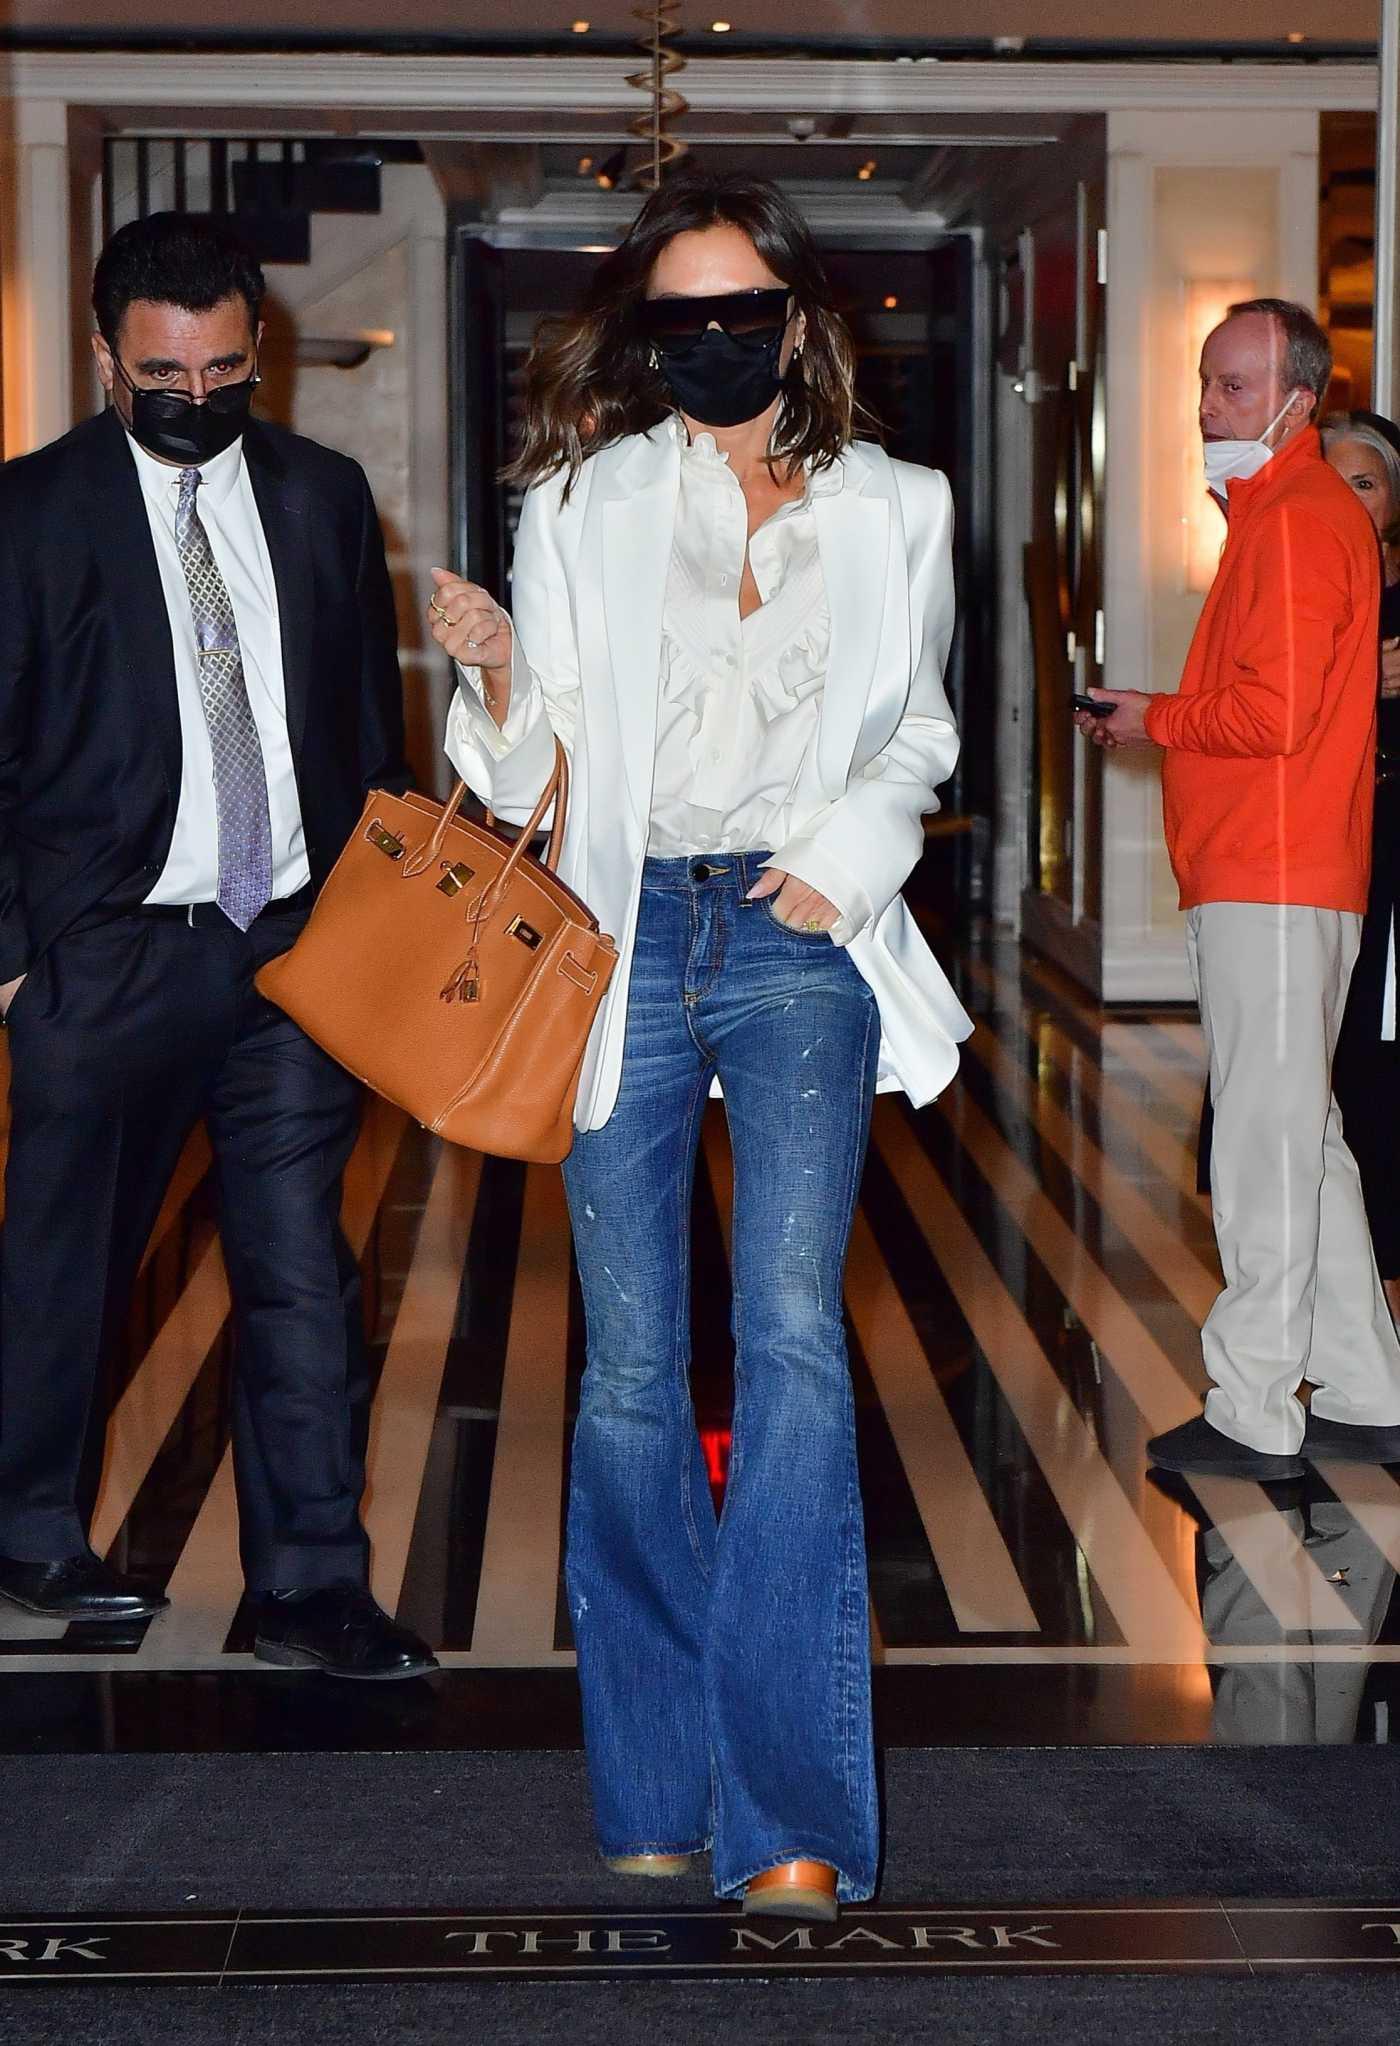 Victoria Beckham in a White Blazer Leaves The Mark Hotel in New York 05/24/2021